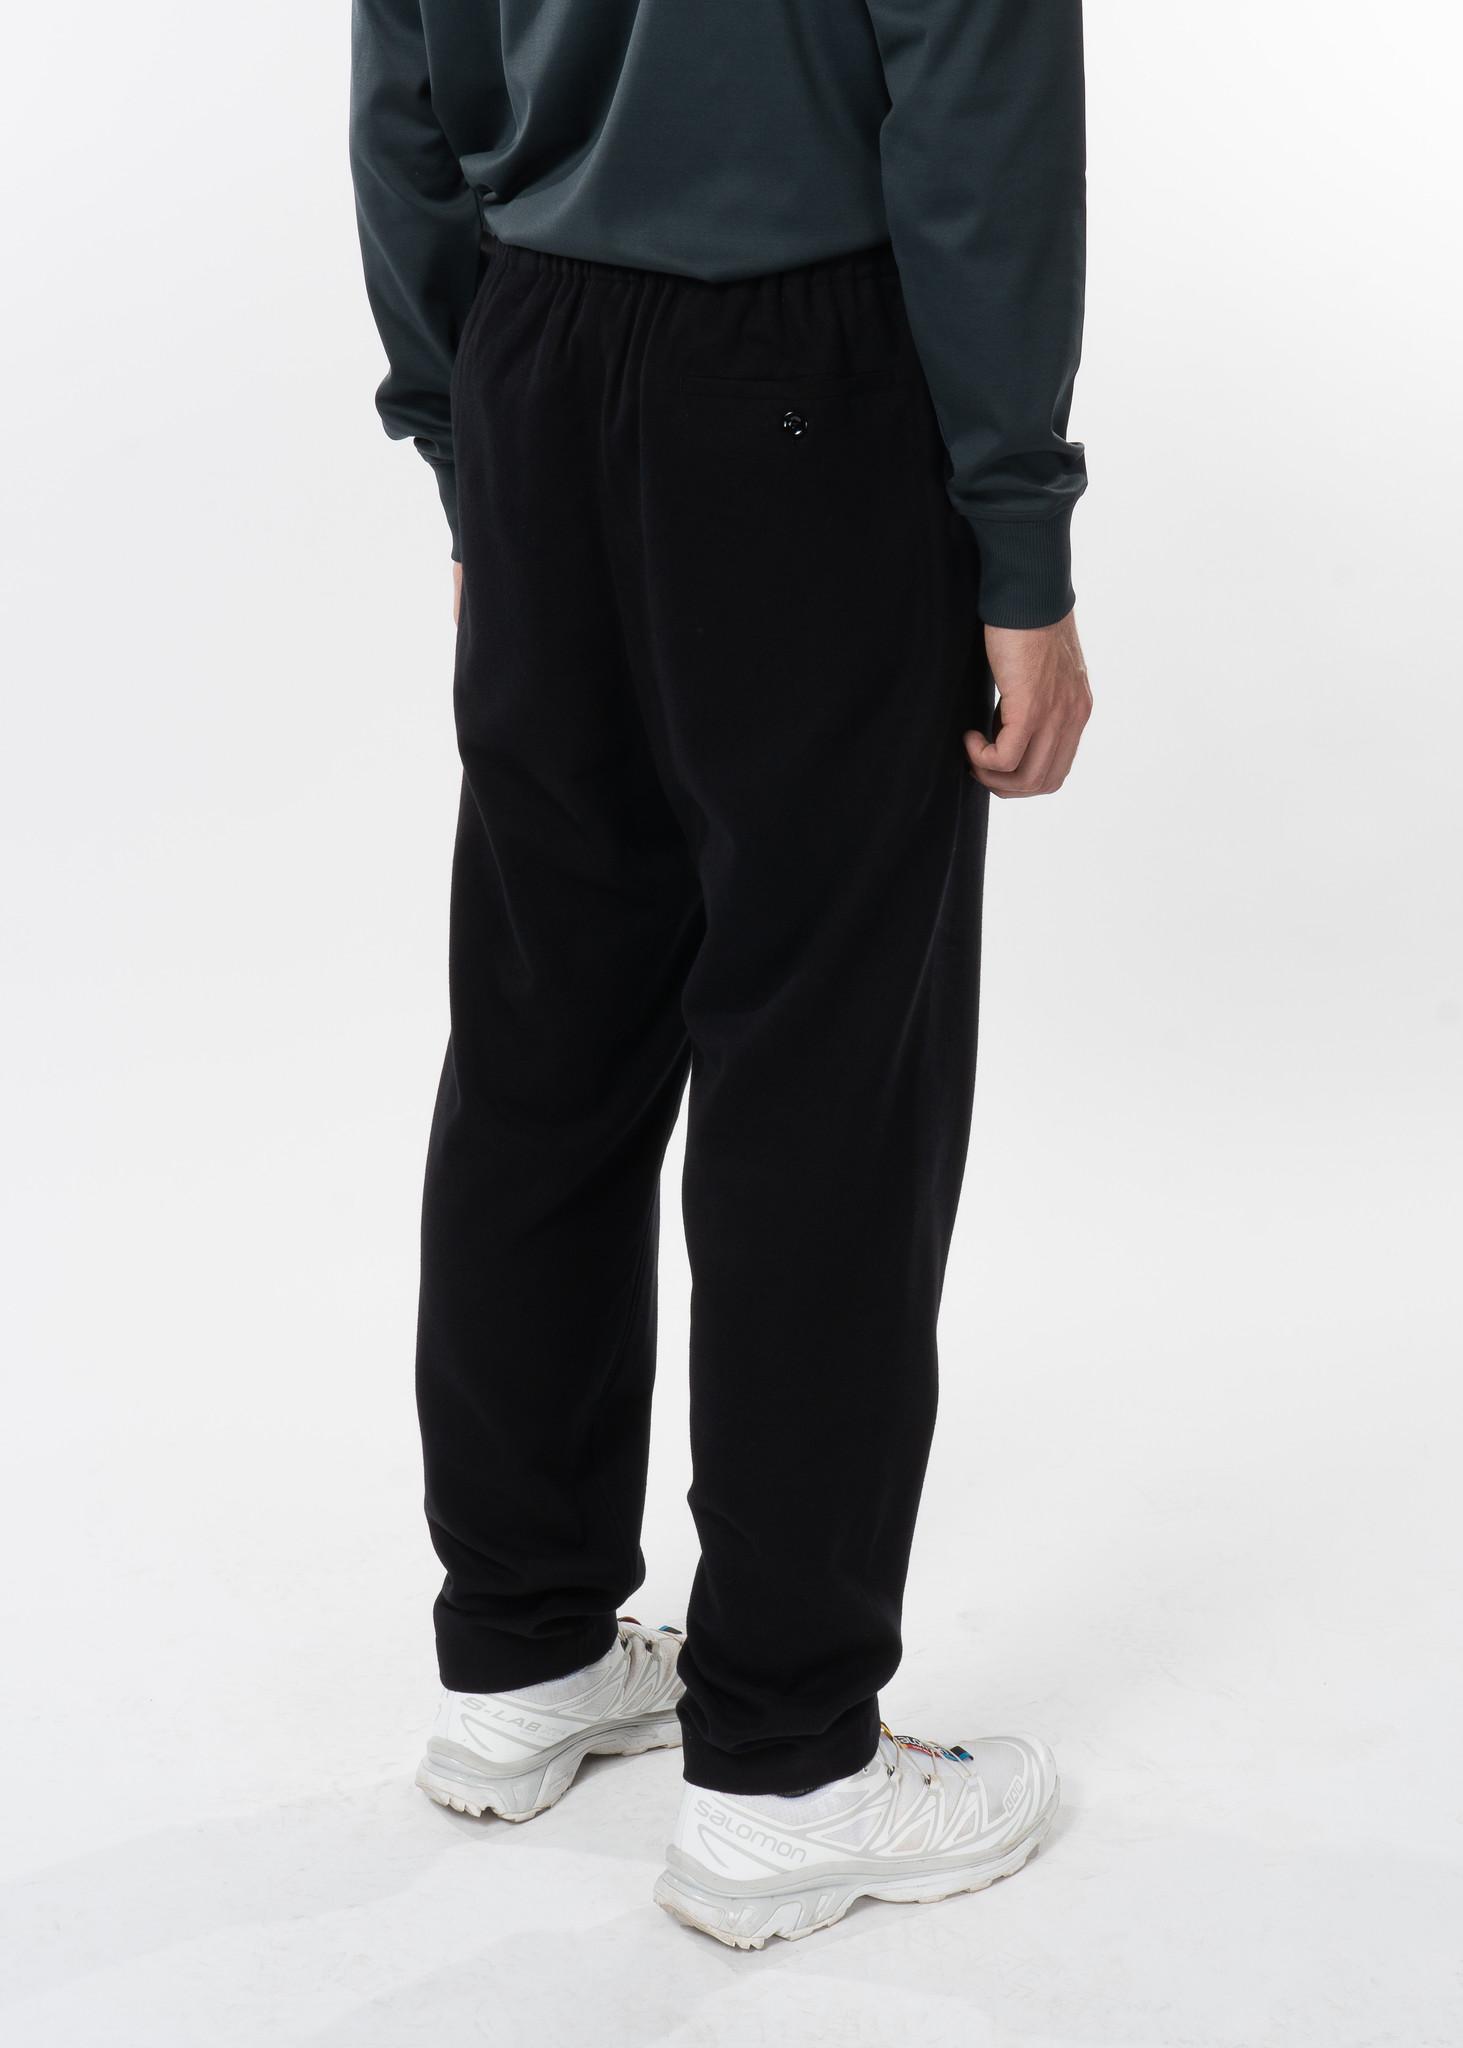 Black Pyjama Pants